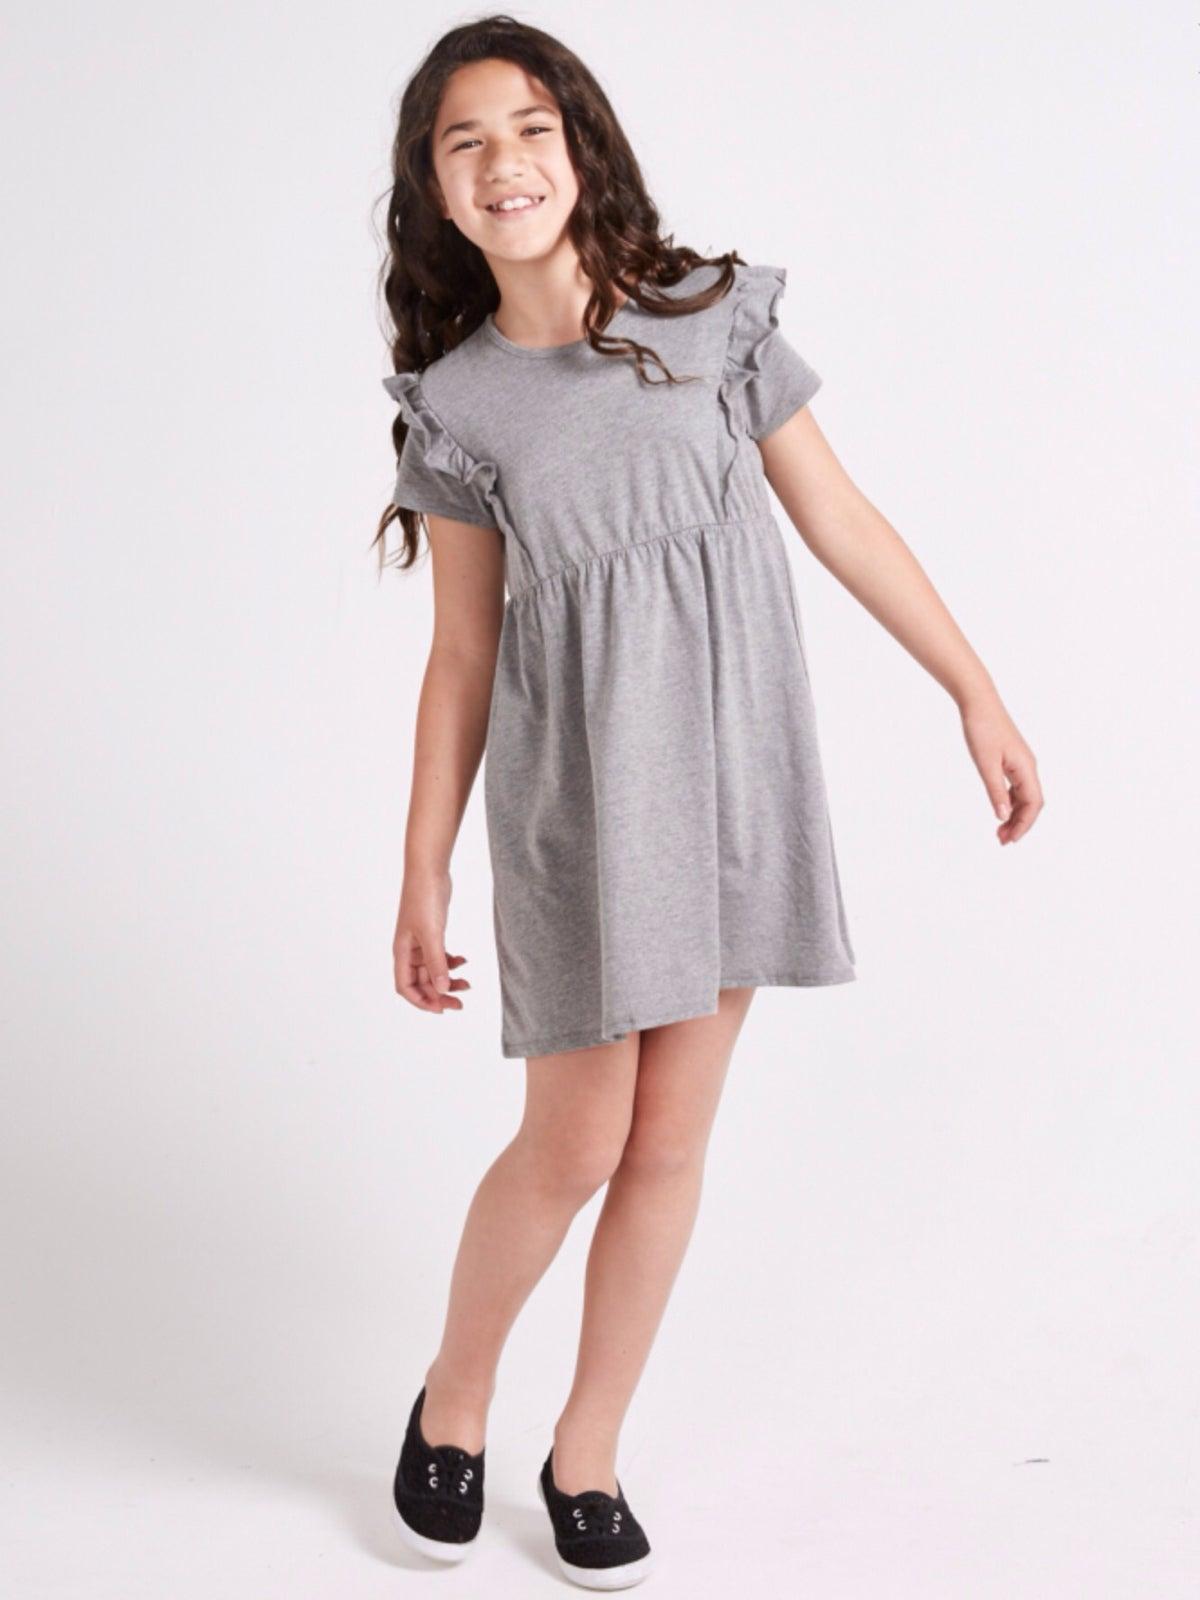 Image of Girls grey dress